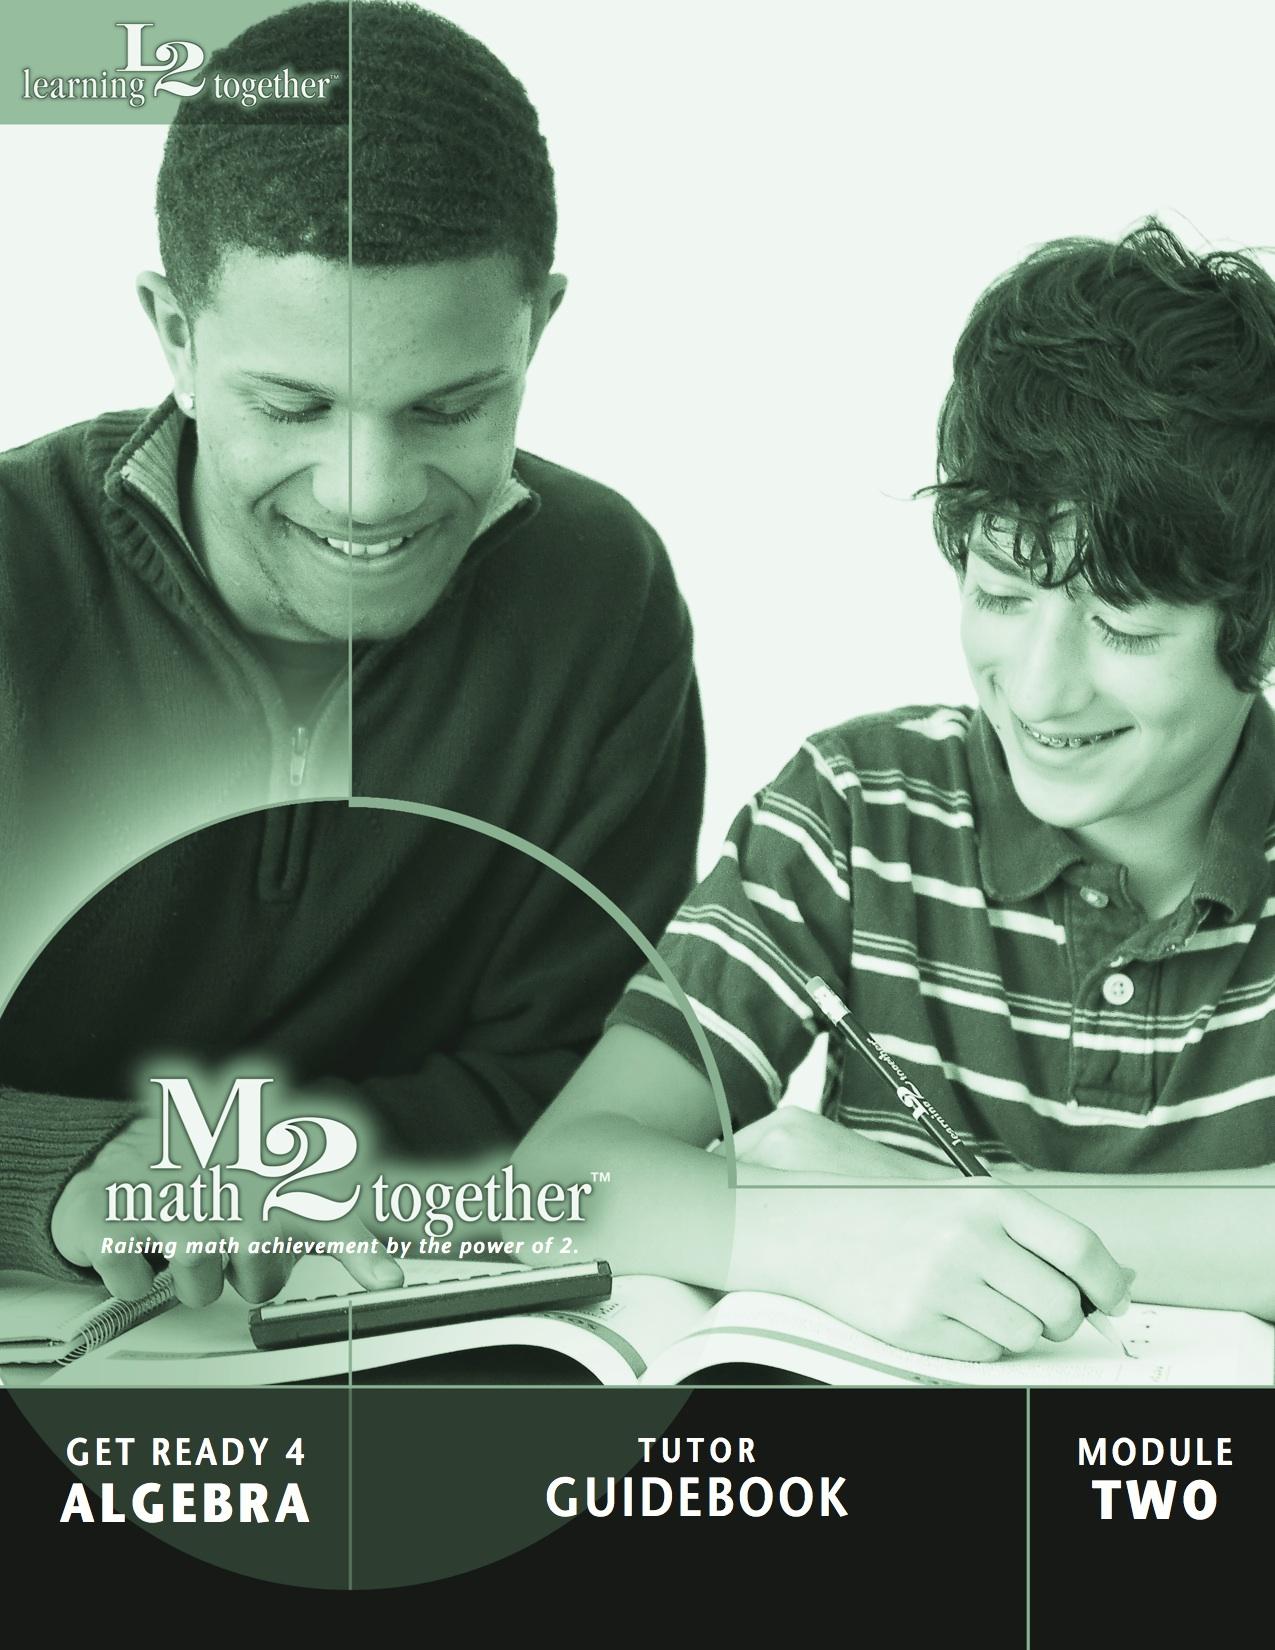 M2_GR4A_MOD2_2TOR_COVER.jpg